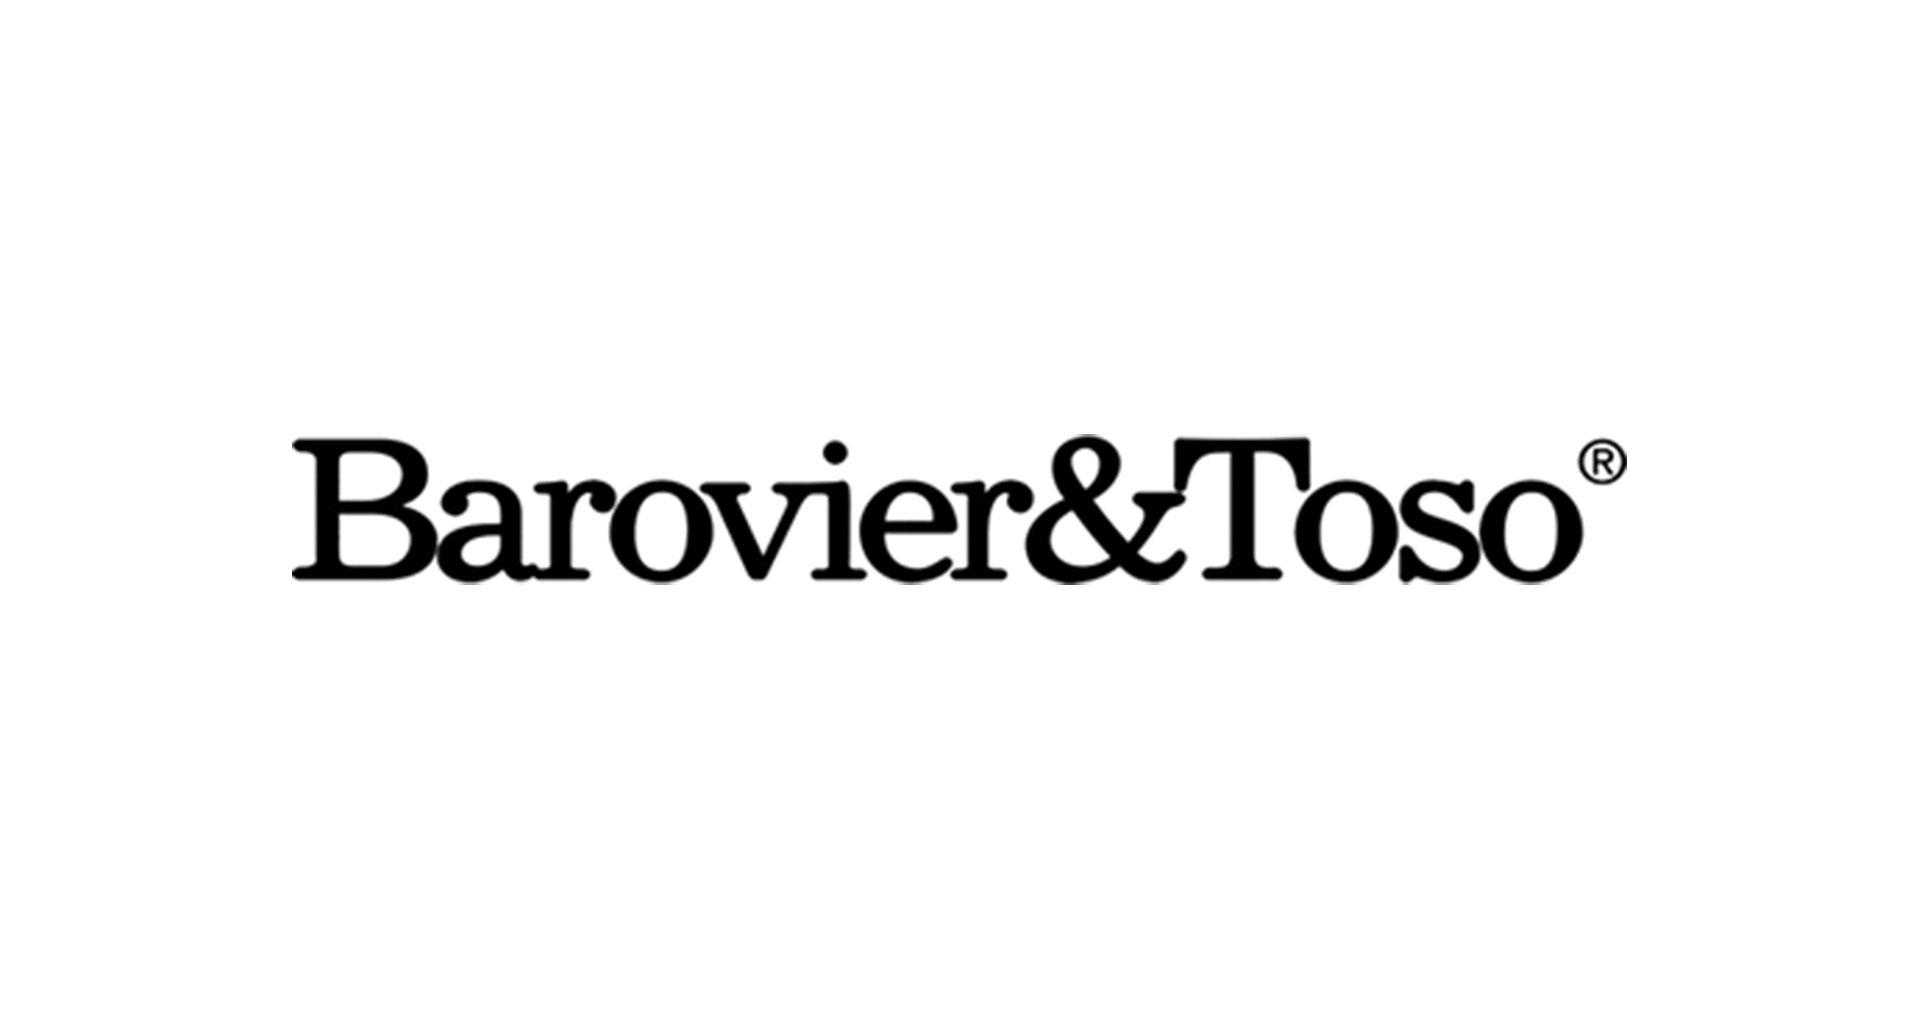 Barovier&Toso